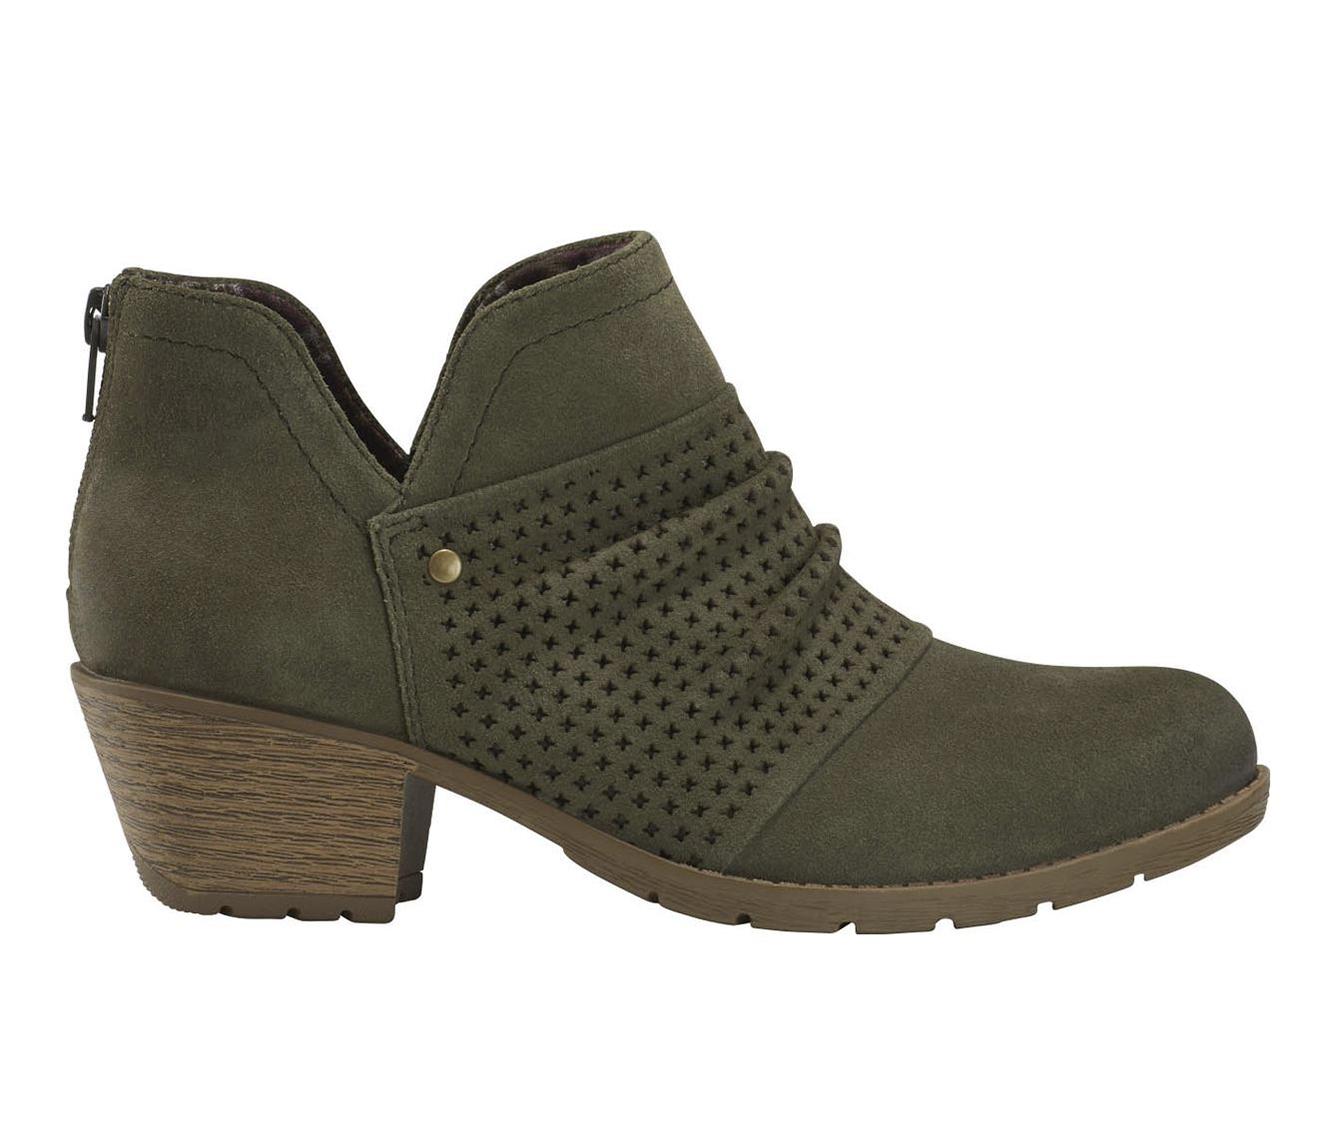 Earth Origins Oakland Amanda Women's Boots (Green - Suede)